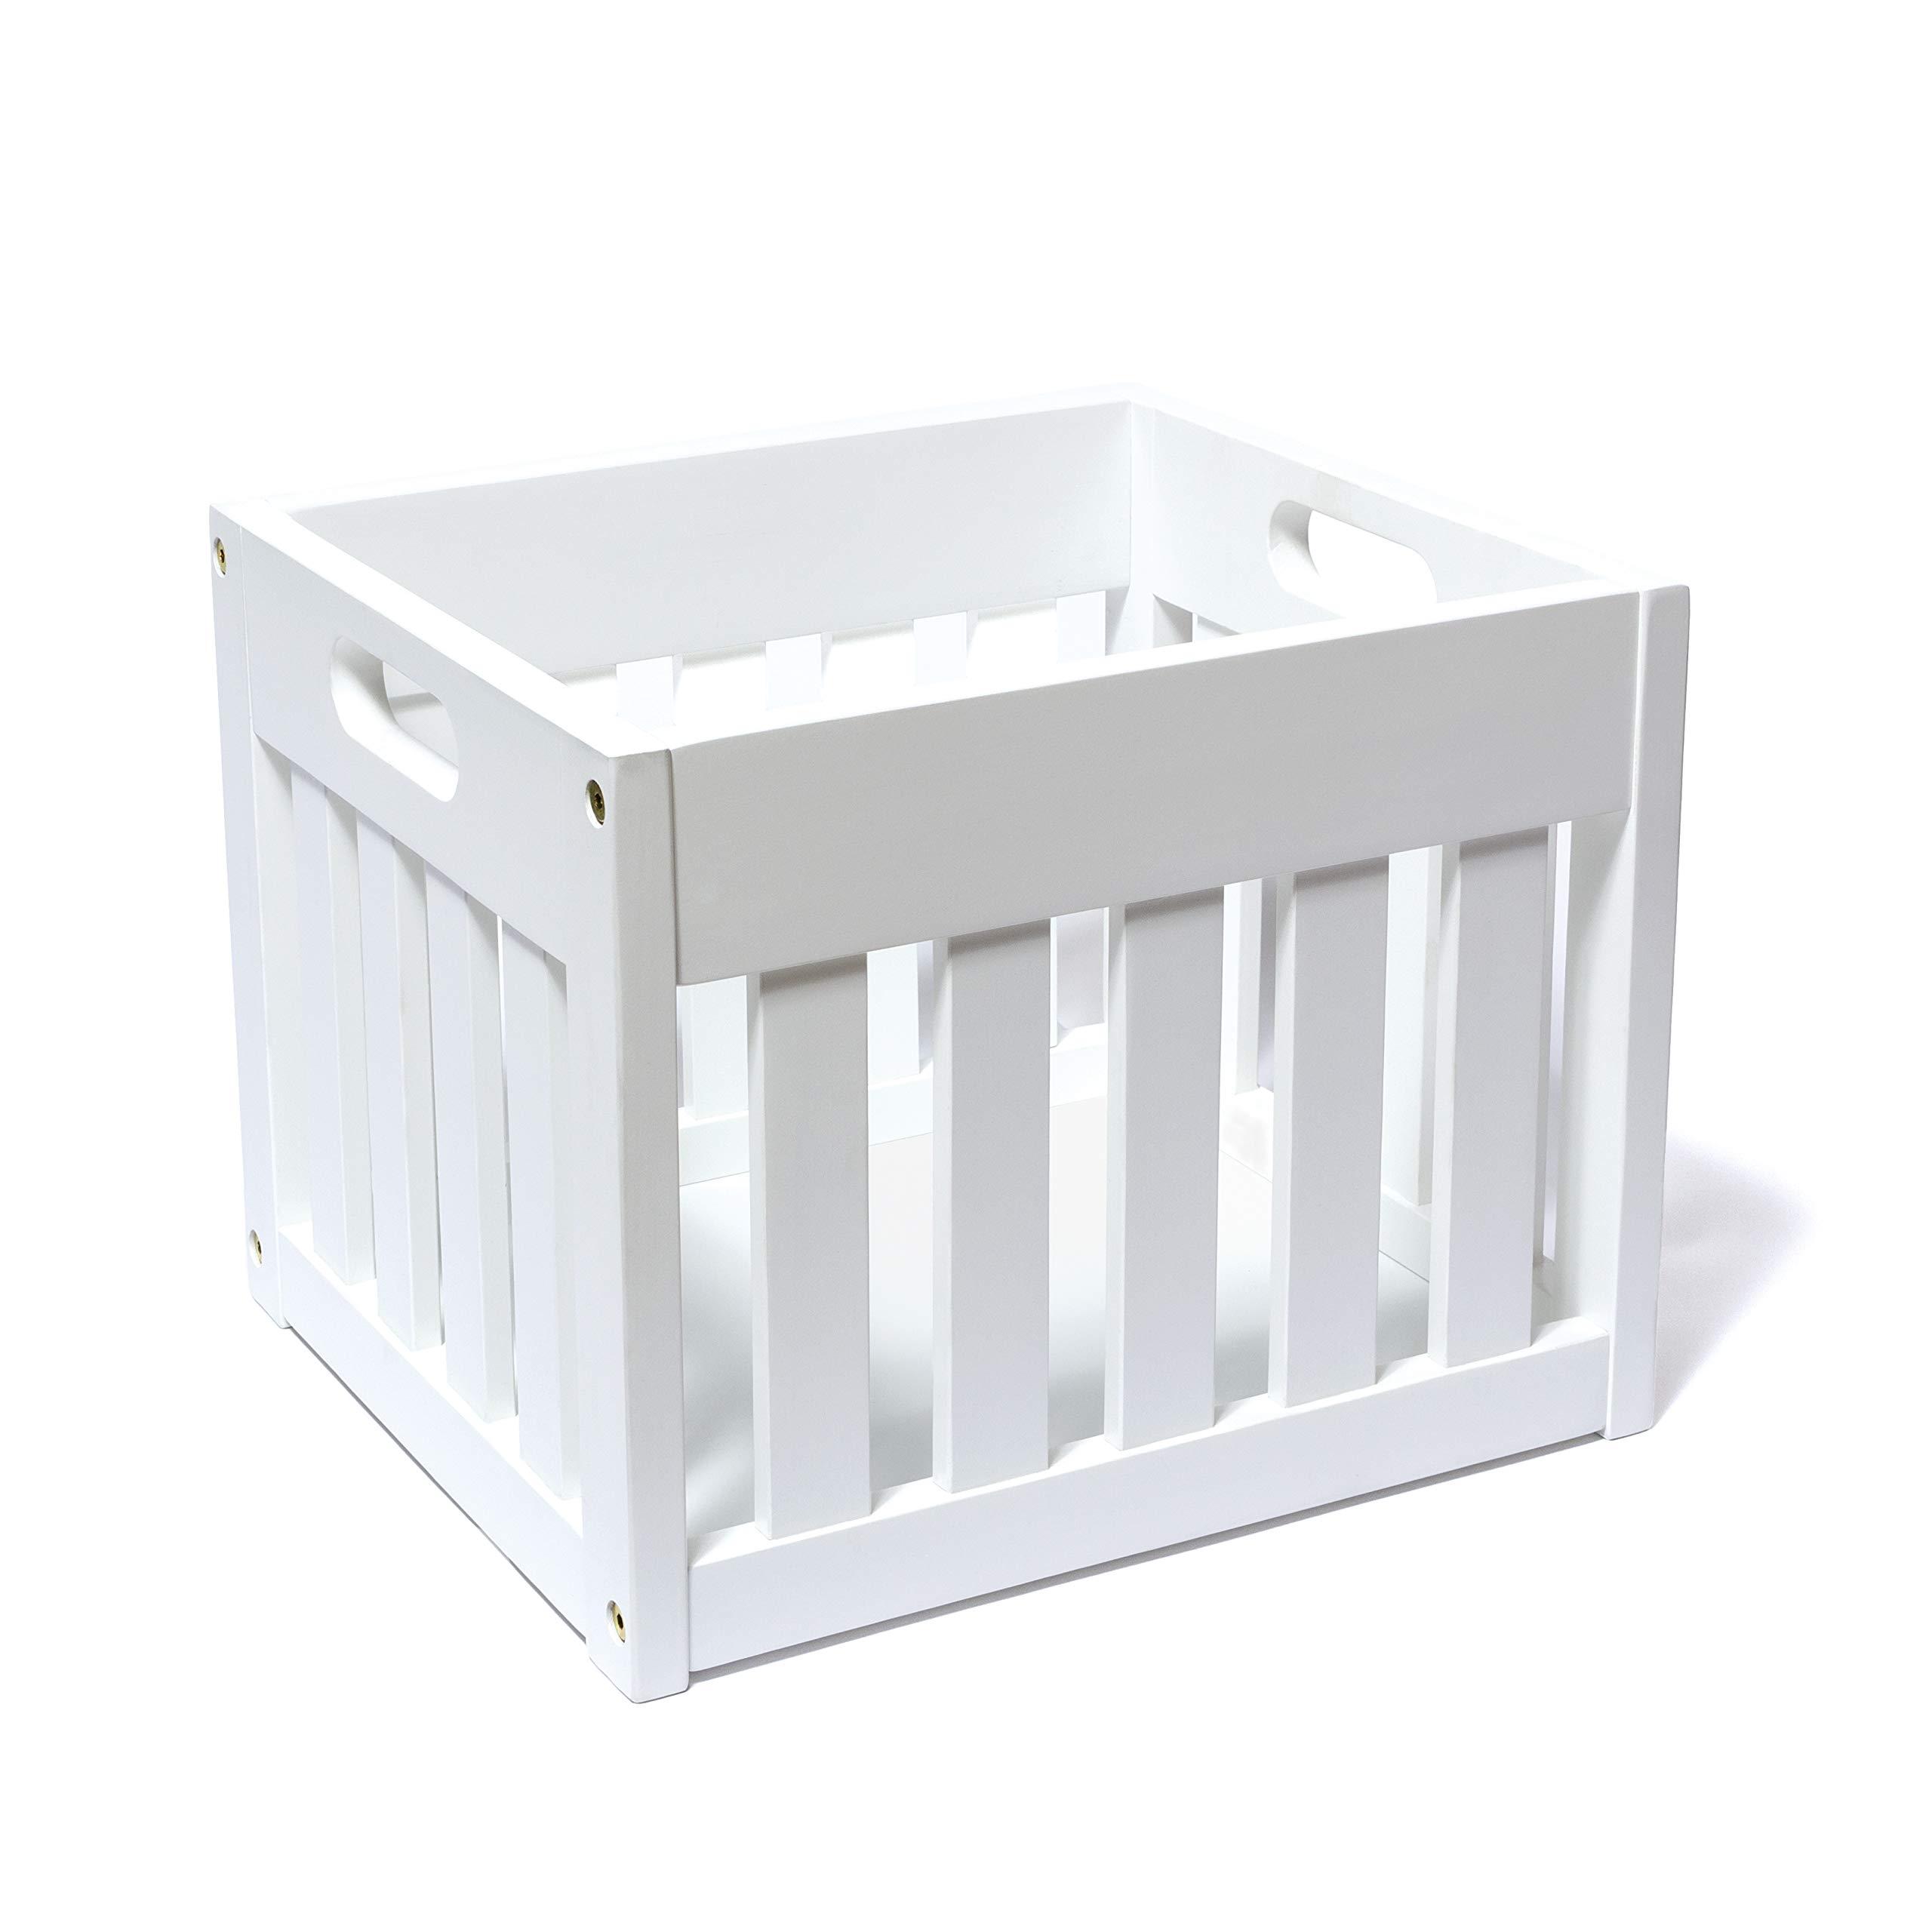 Lipper International 540W Wooden Crate, White Storage, One Size, by Lipper International